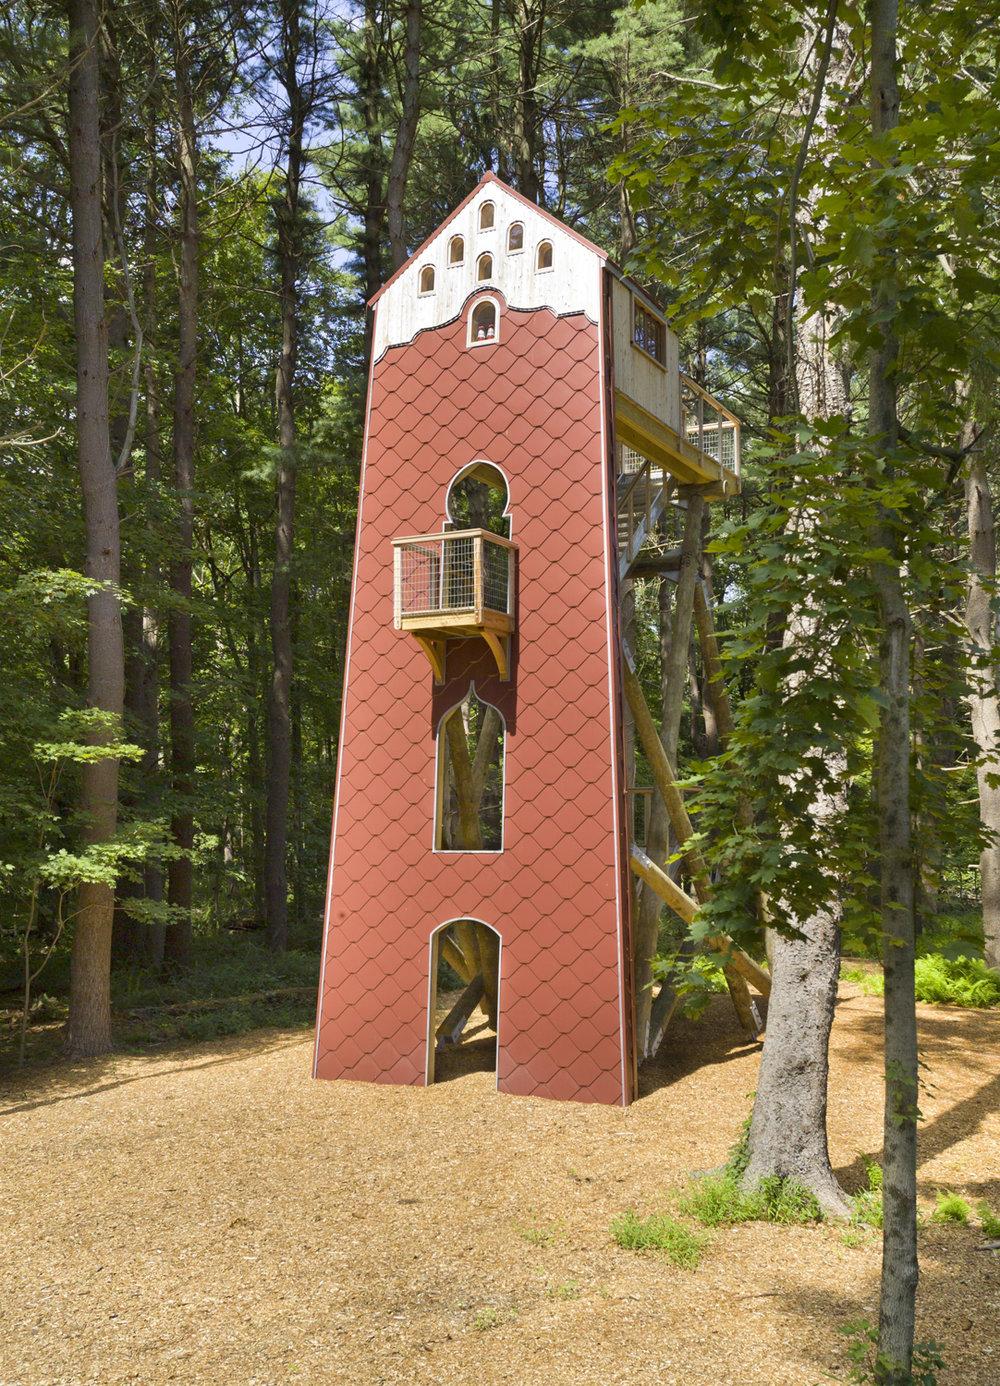 Writer's-folly-tree-house-redding-ct